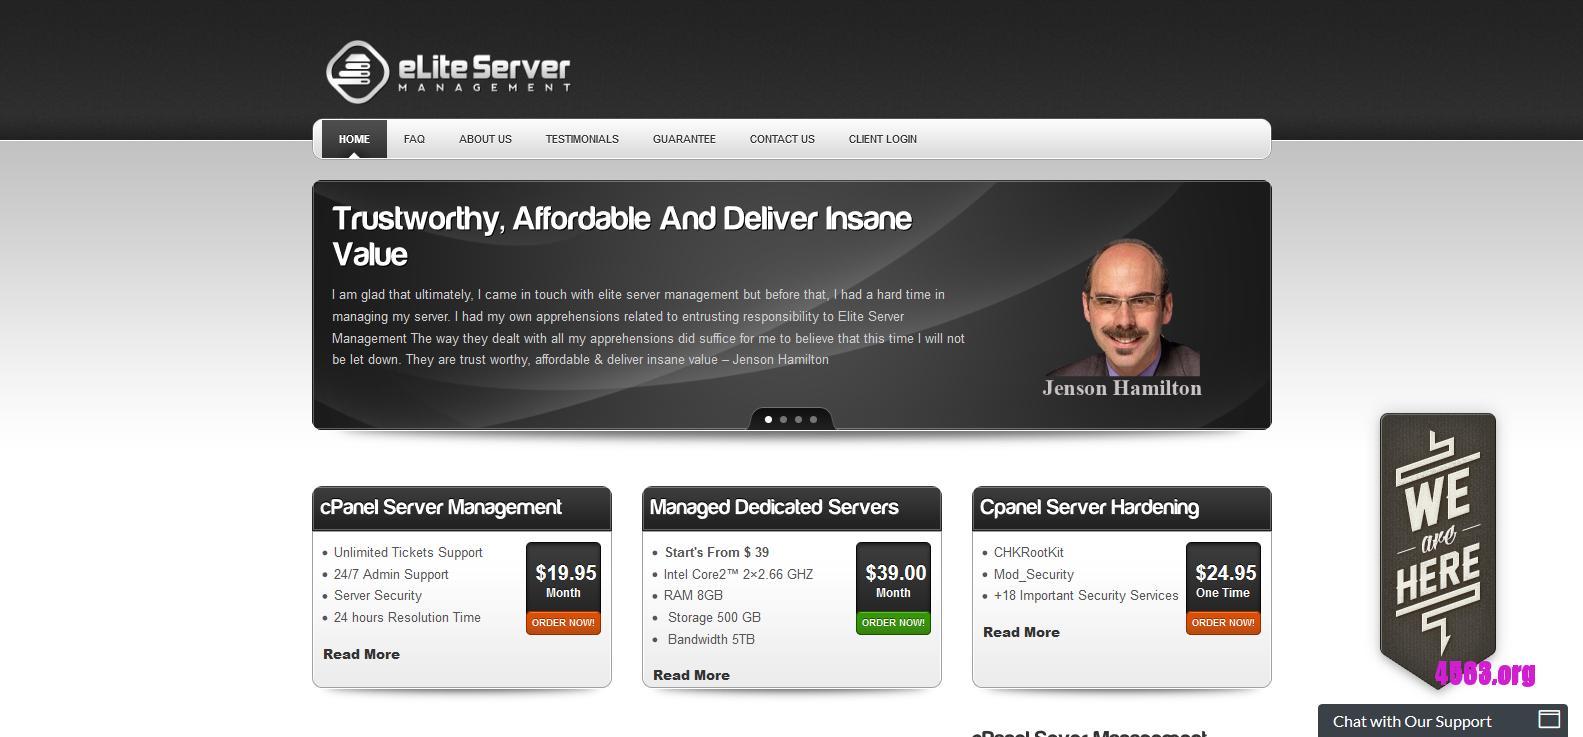 eLite Server Management美国独立服务器@Core2™ 5650/8GB内存/500GB硬盘/10TB流量@$19.5/月